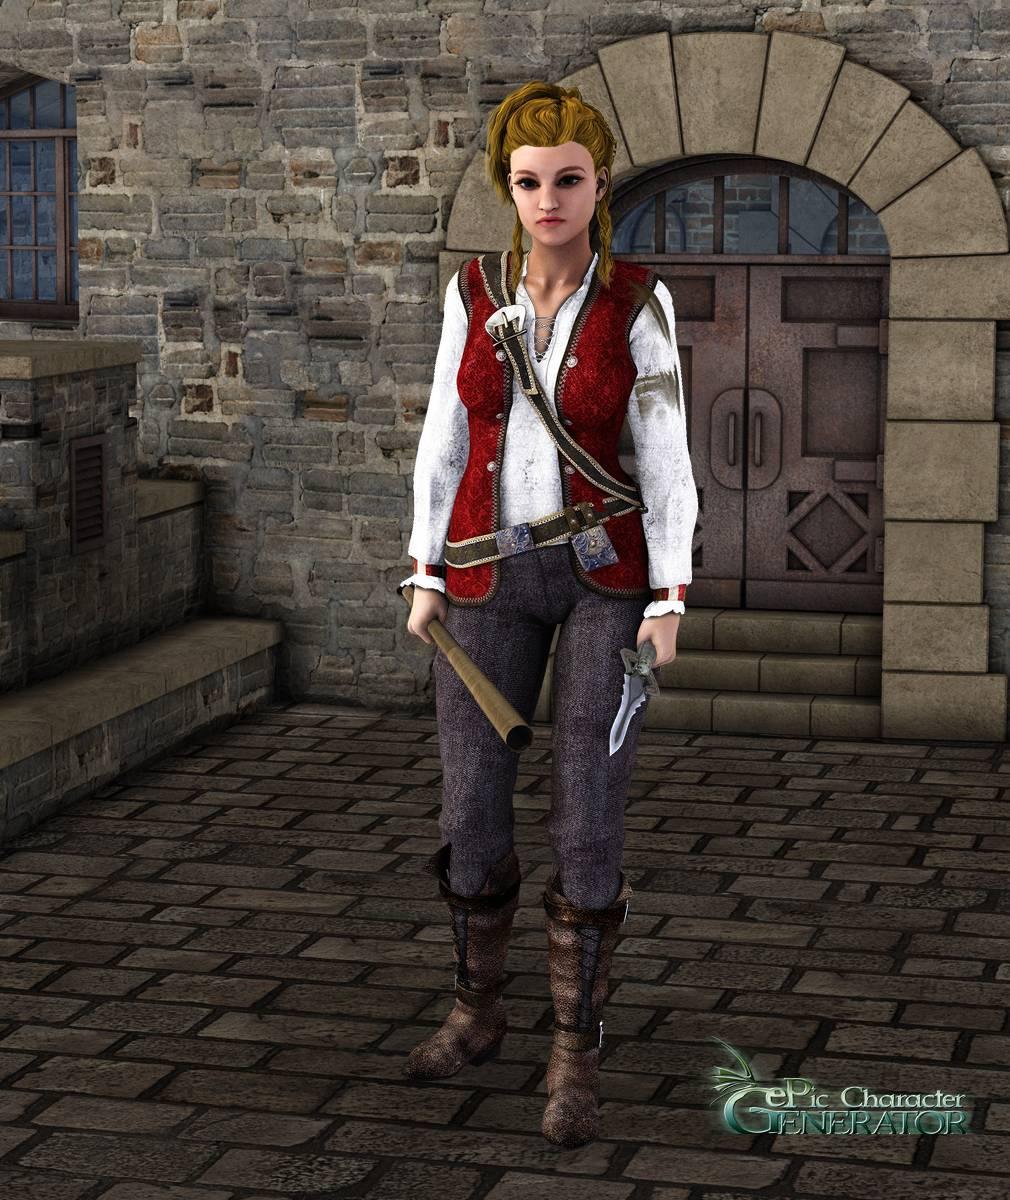 ePic Character Generator Season 2 Female Pirate Screenshot 06